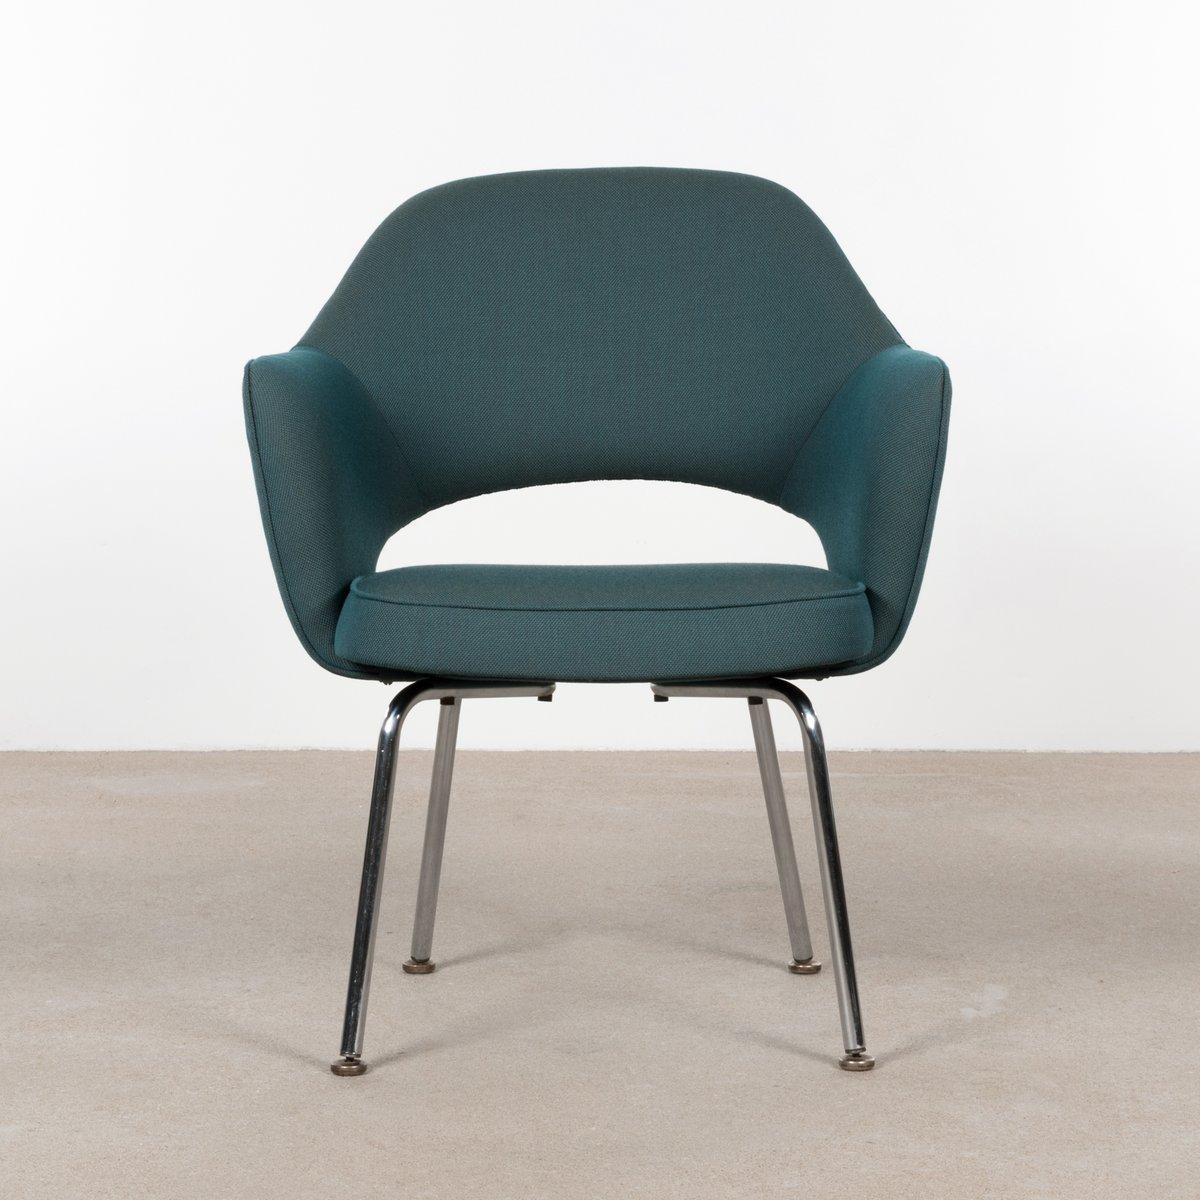 Executive Armchair By Eero Saarinen For Knoll U0026 De Coene, 1960s